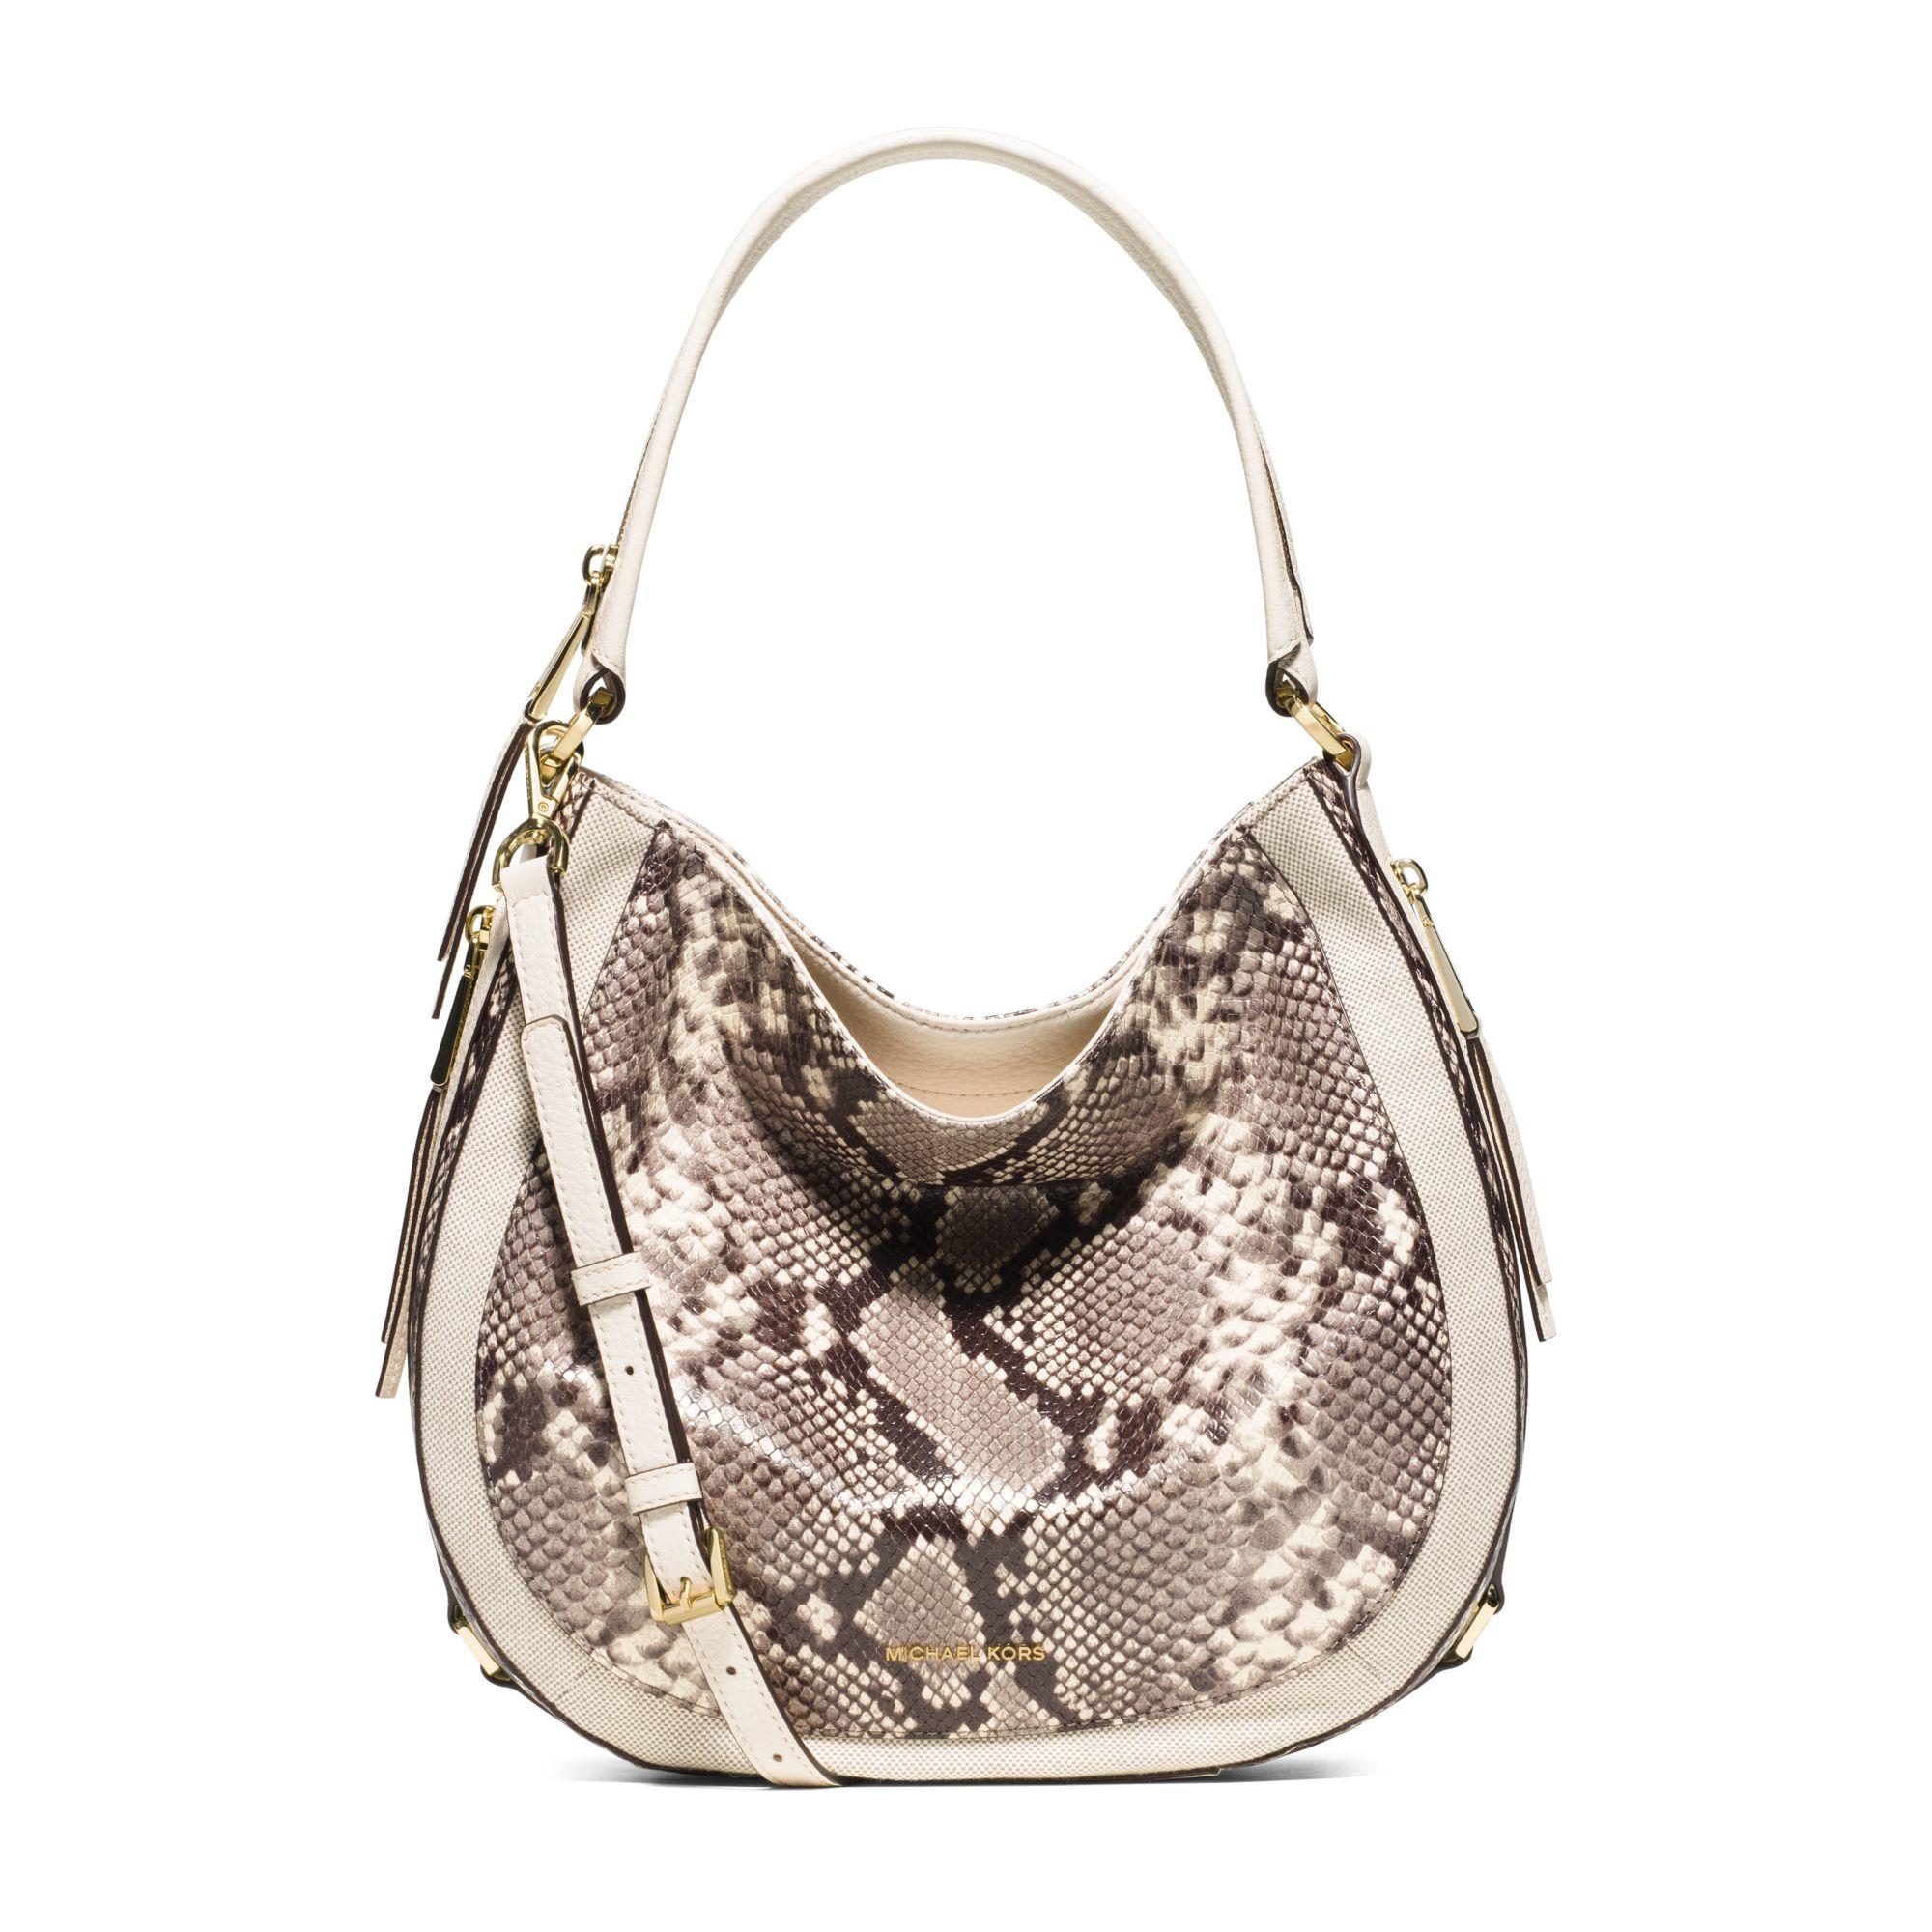 89e44d04c484 michael kors embossed leather bag susannah tote ebay - Marwood ...